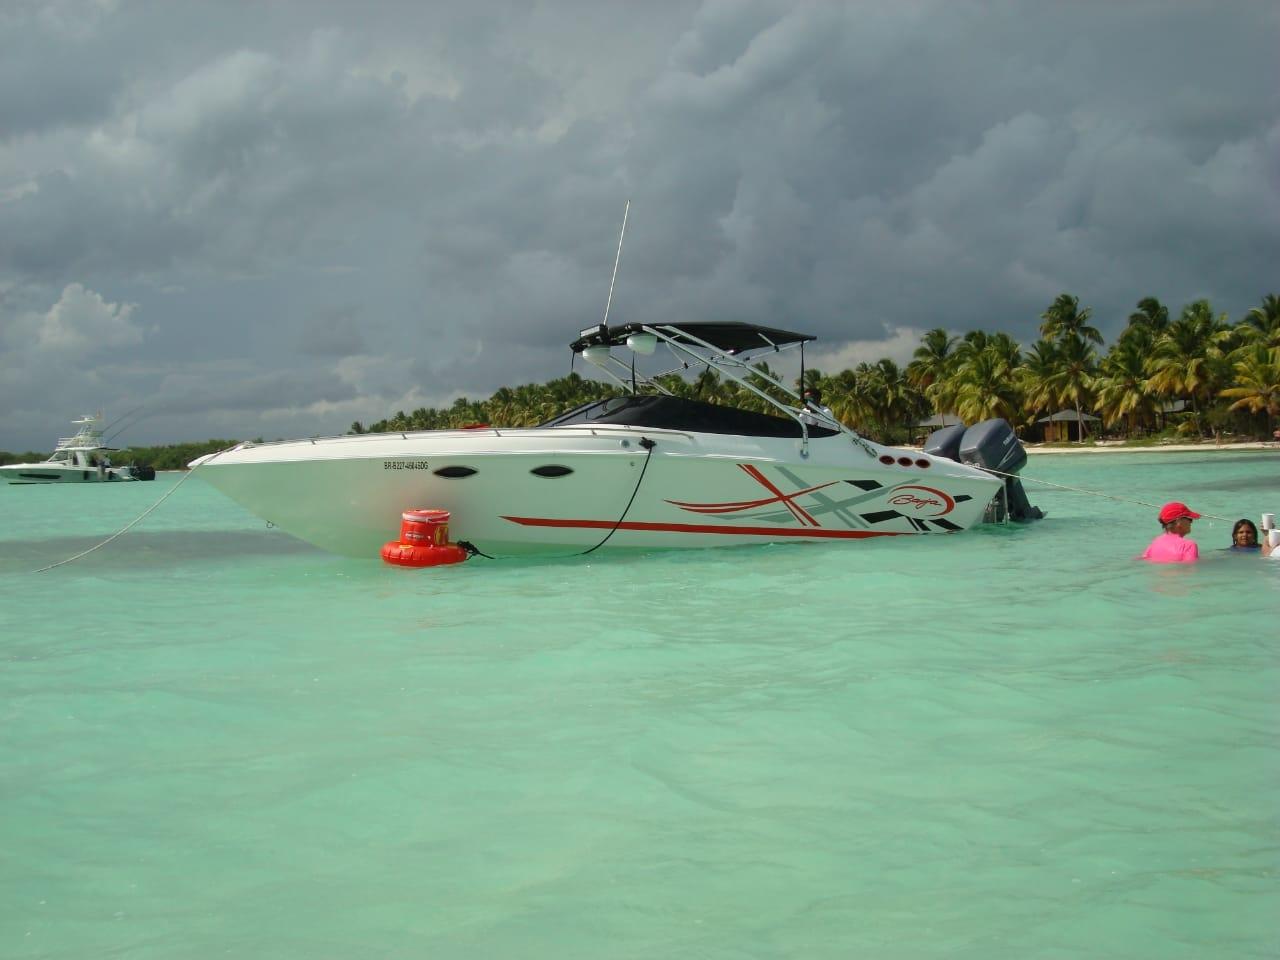 barco-motor-bayahibe-saona-3